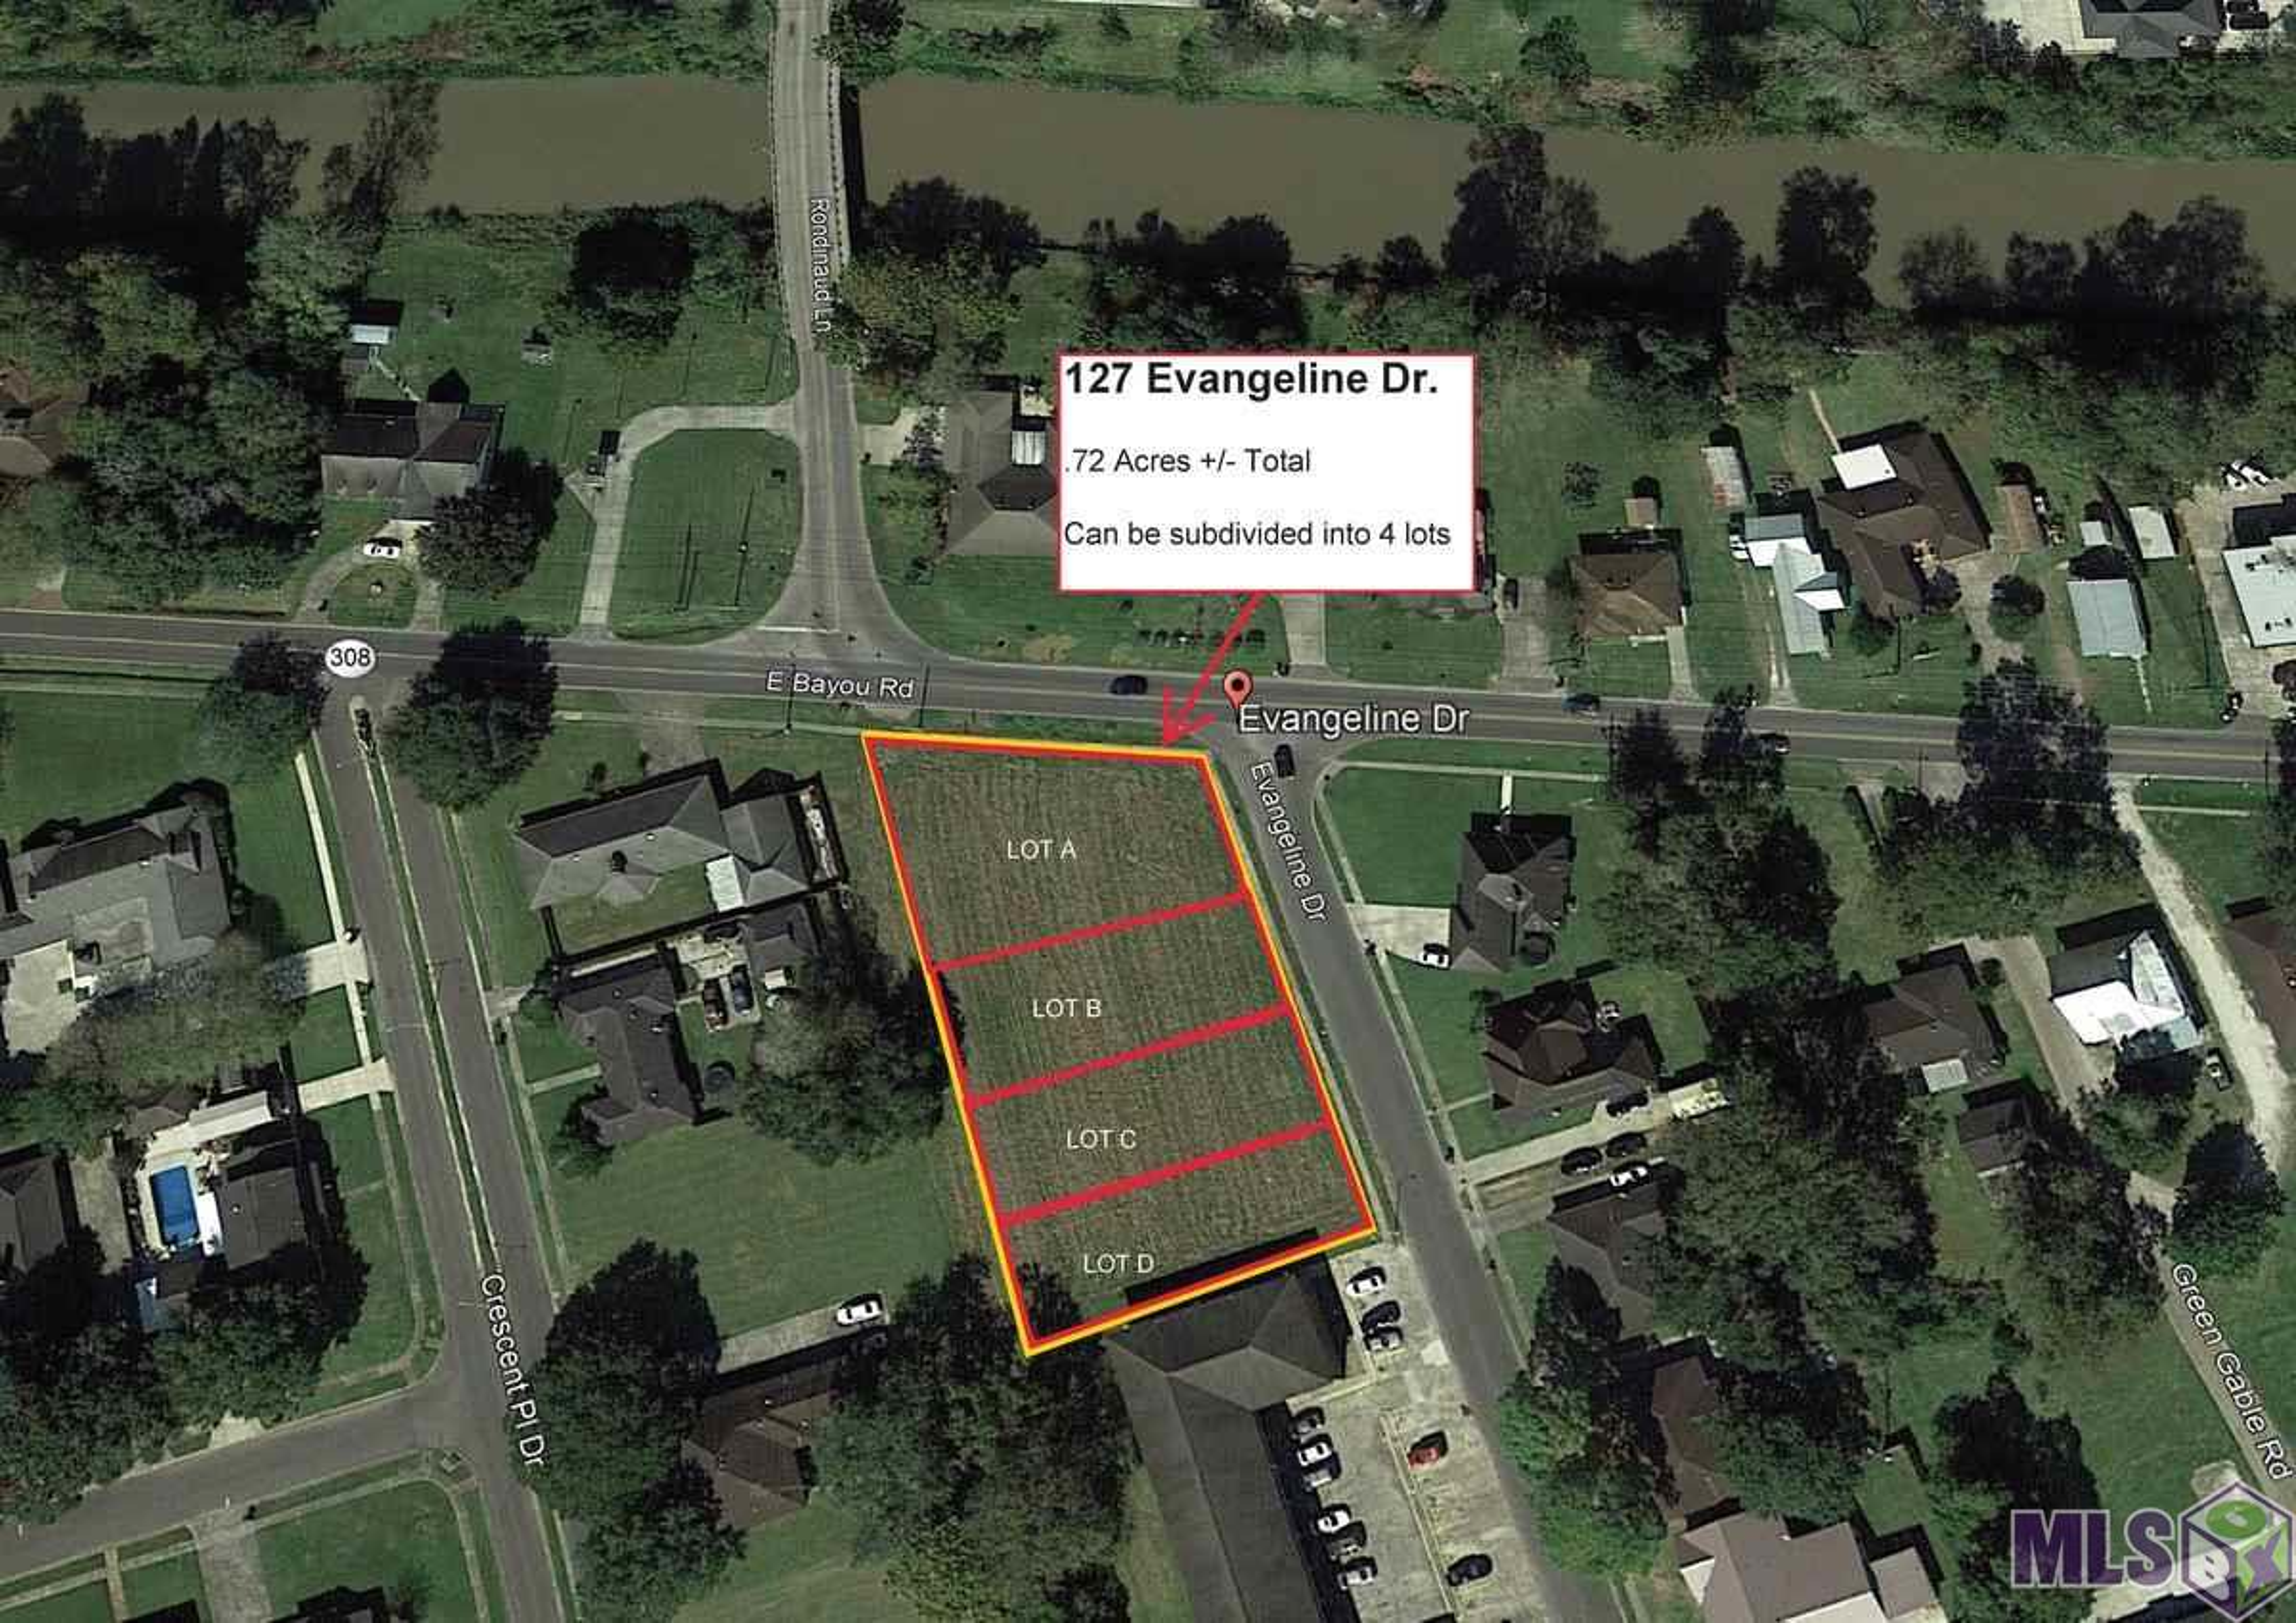 Proposed Lot A Evangeline Dr, Donaldsonville LA 70346